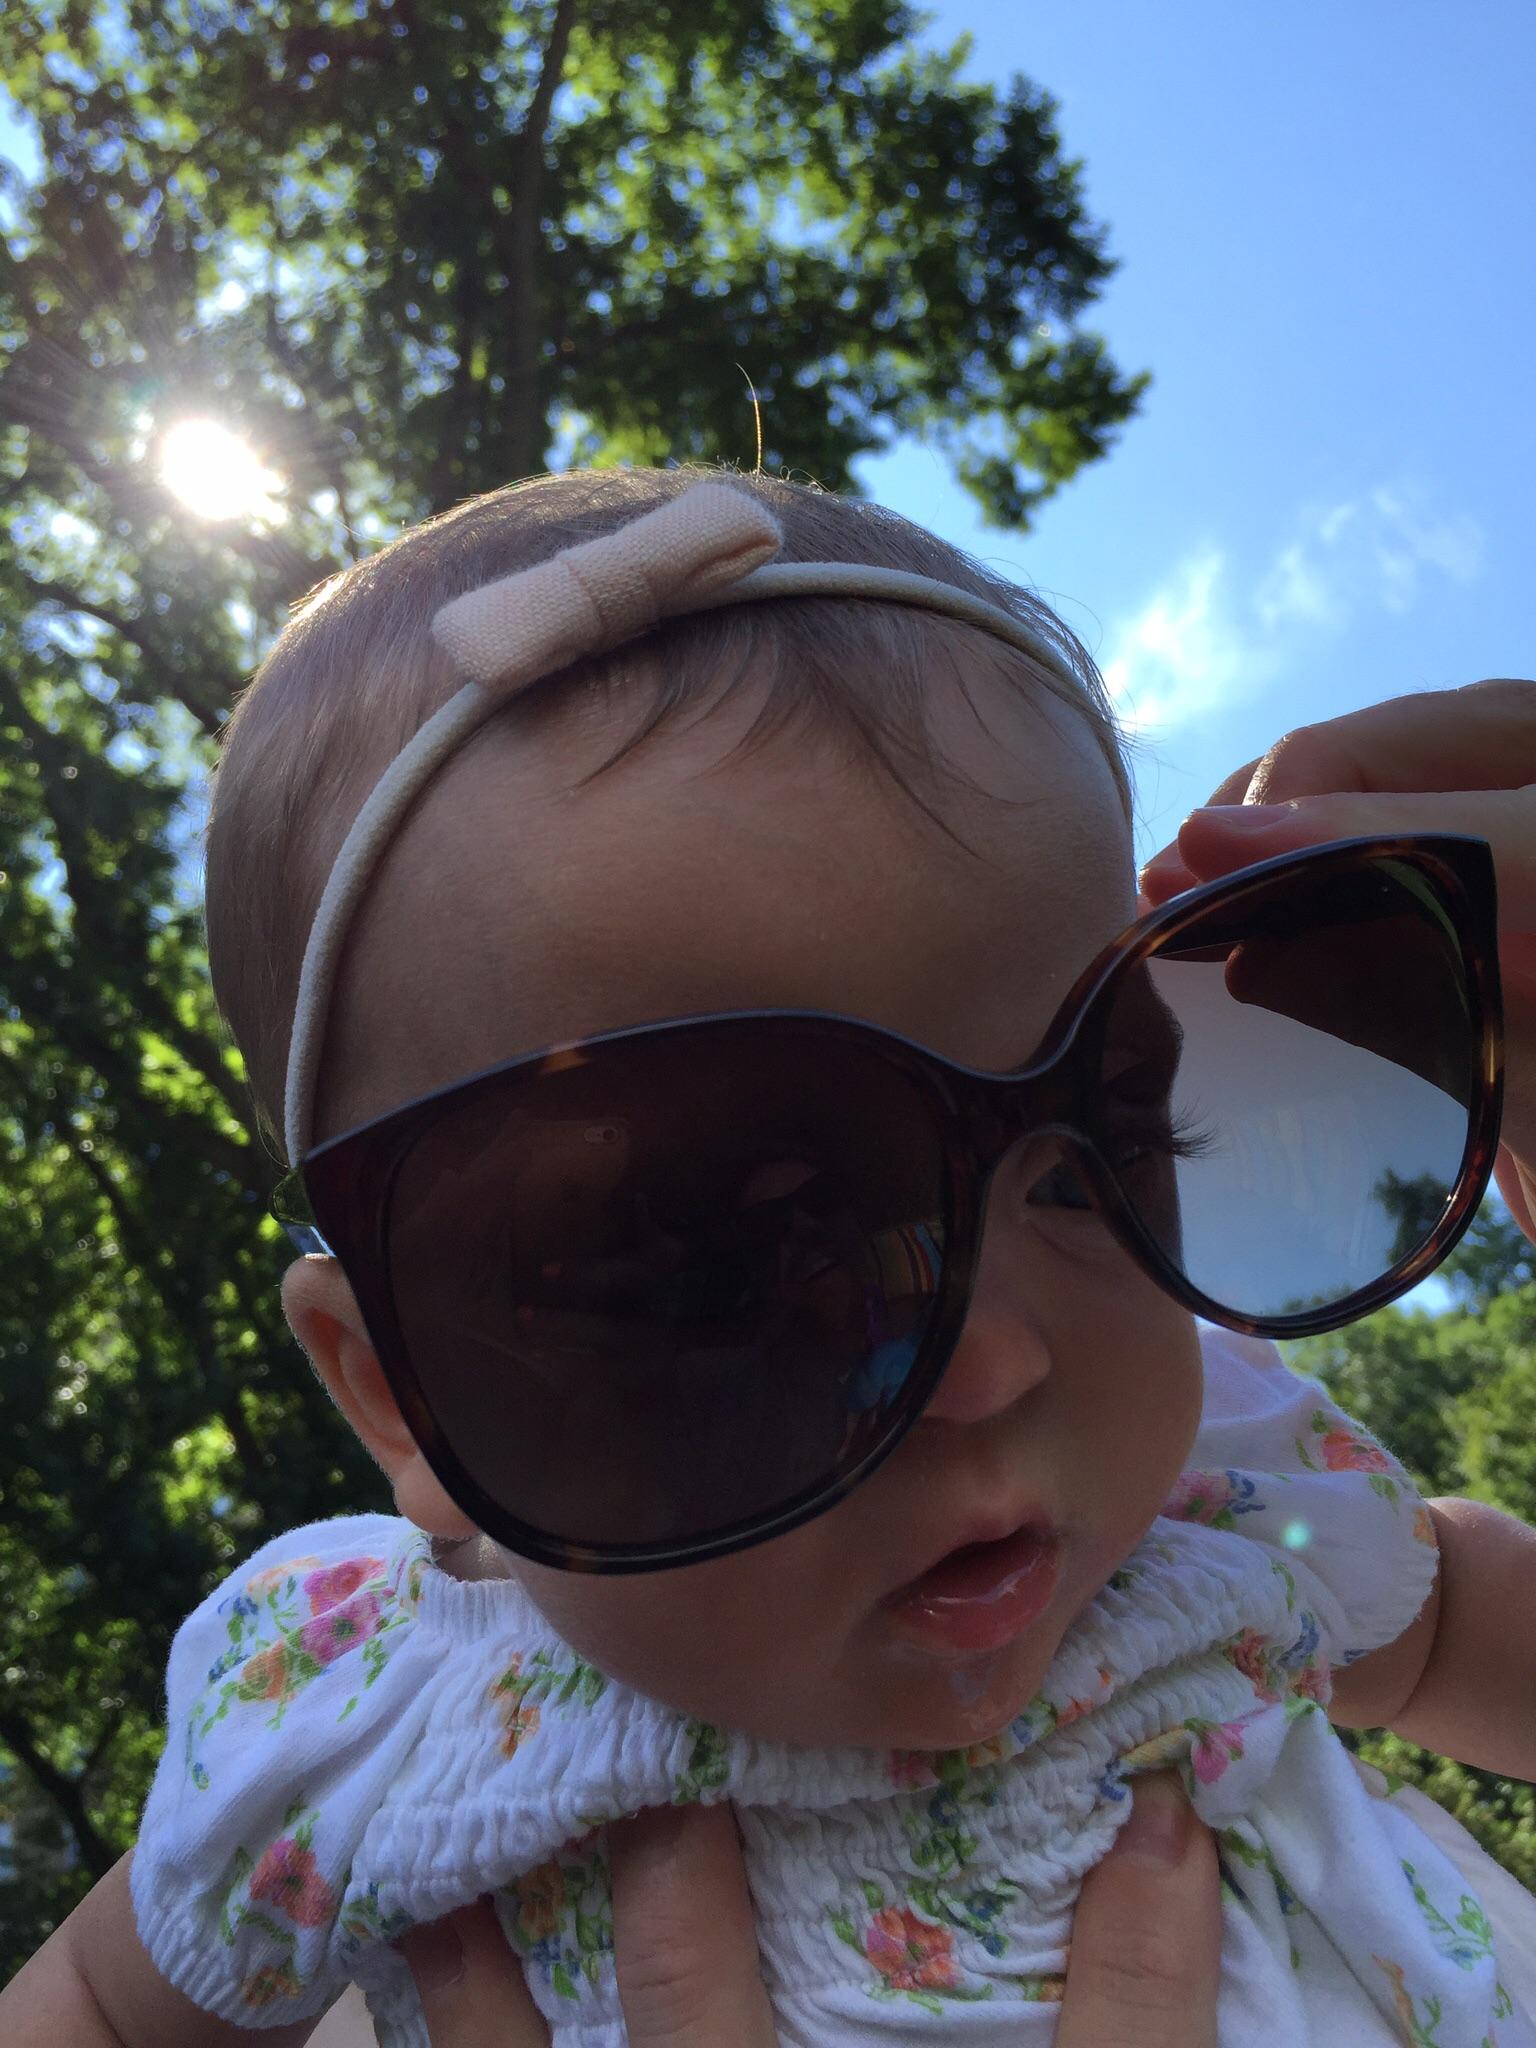 Sunshine in Central Park